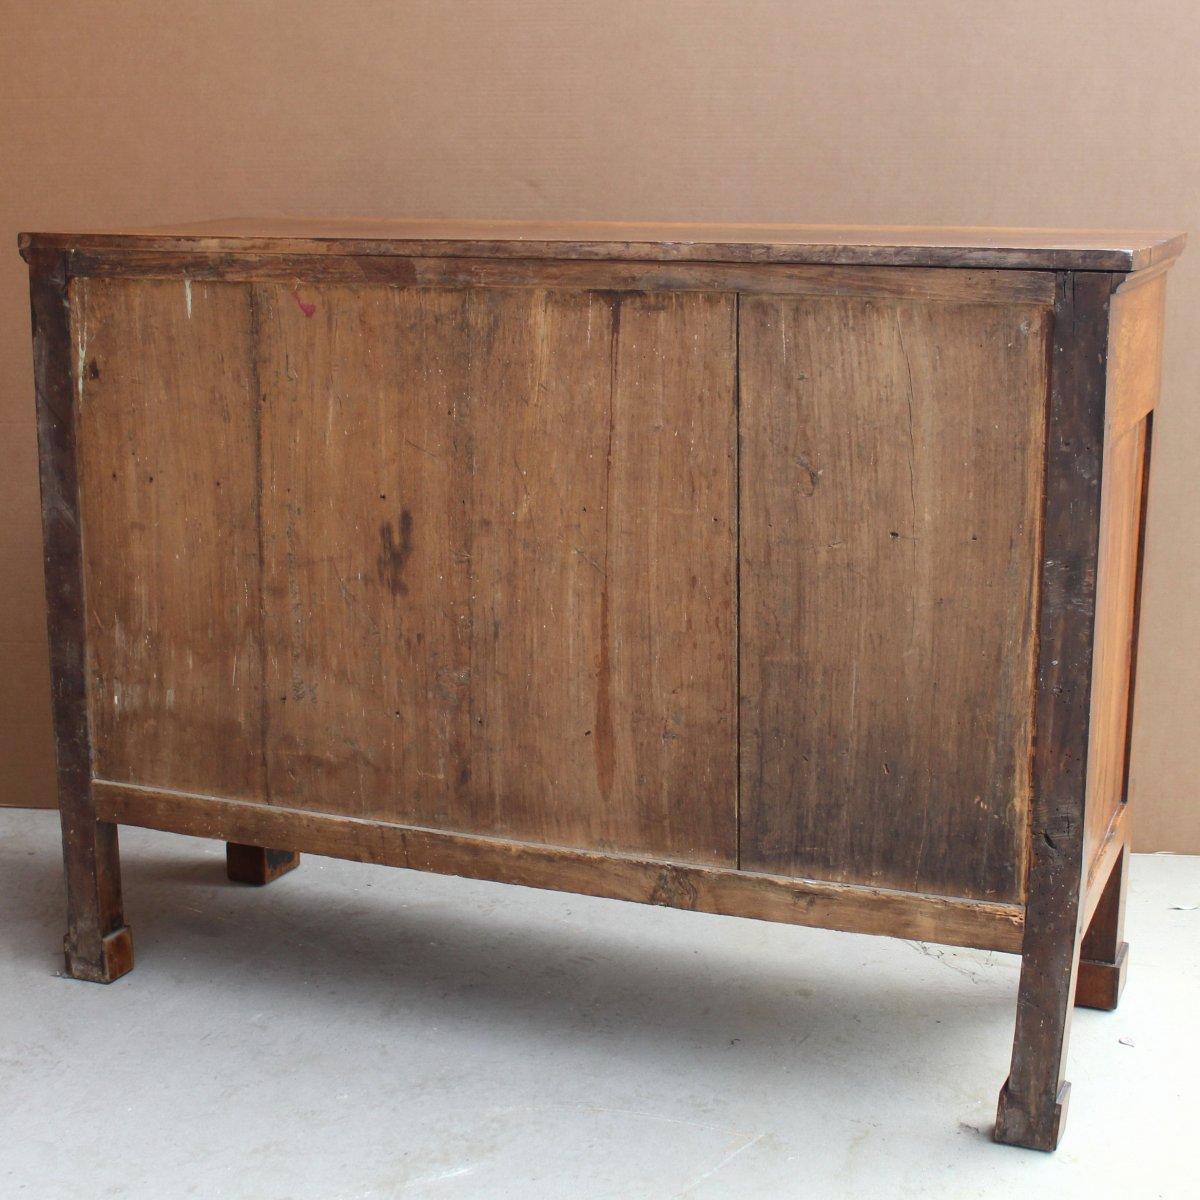 Antique Empire Sideboard Dresser Cabinet Cupboard Buffet In Walnut - Italy 19th-photo-8